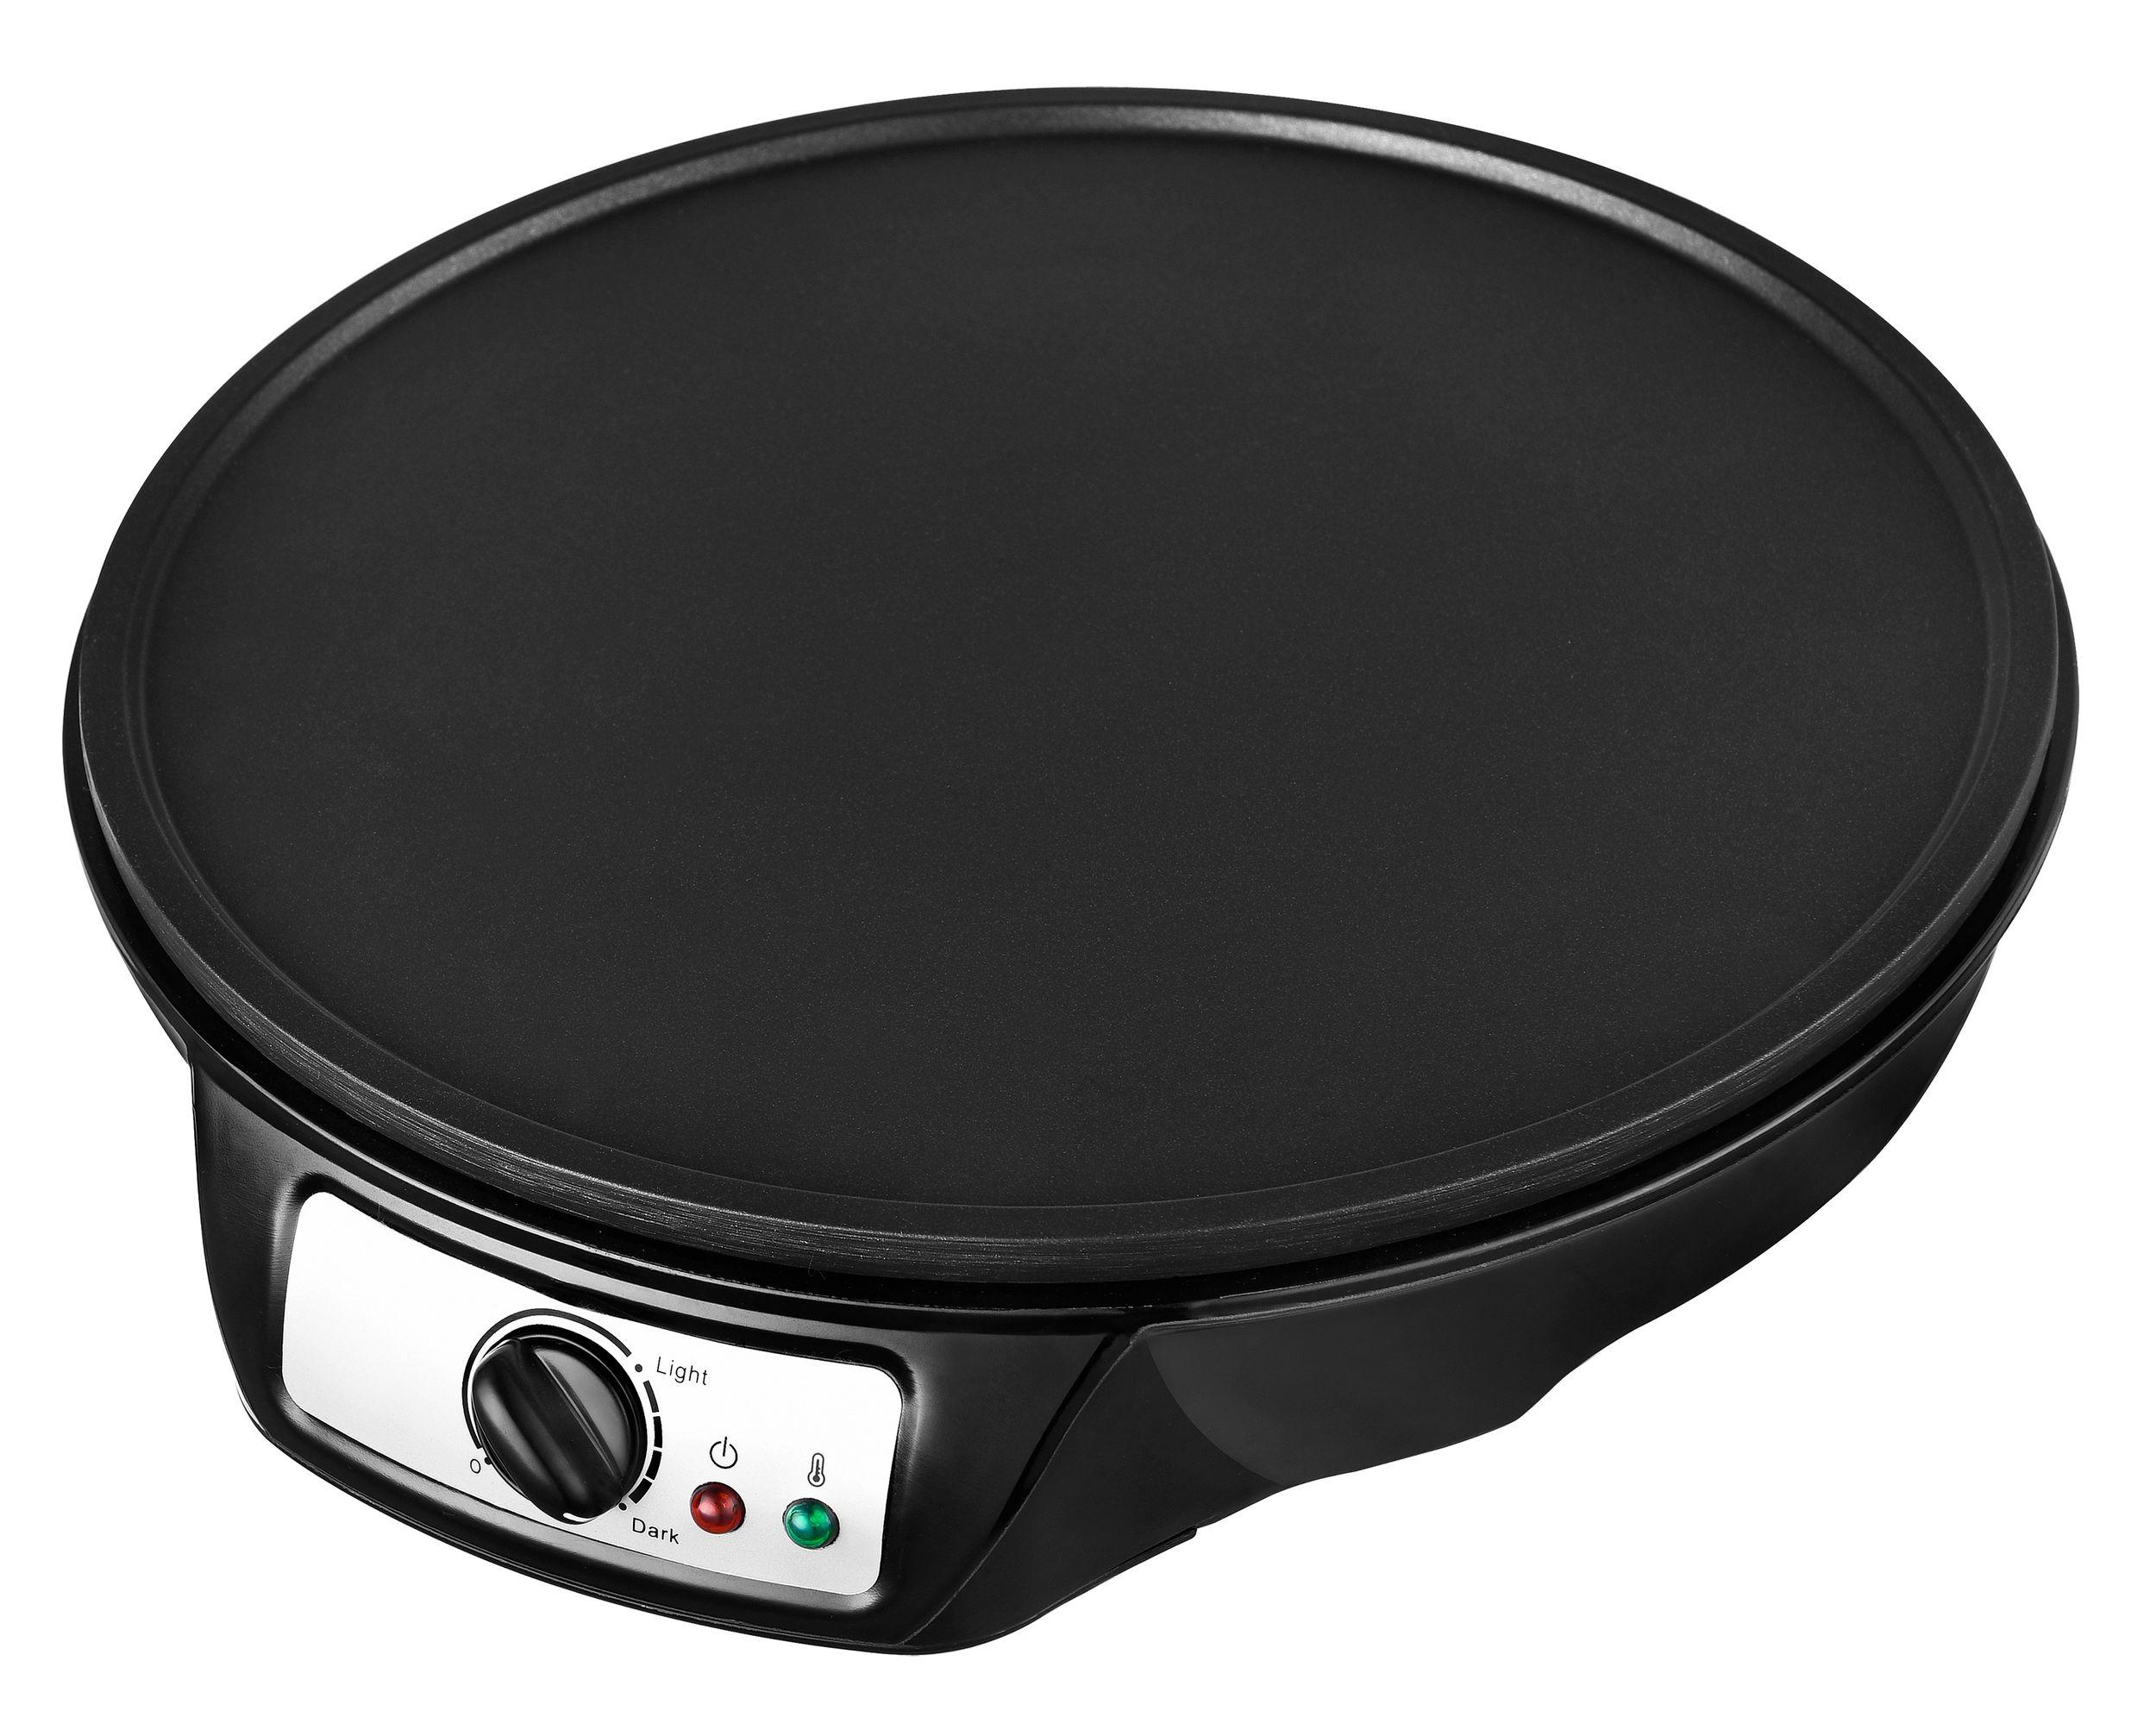 Crepes-Maker Crepeseisen Crepe Platte 30 cm Pfannkuchen Pfanne Wrap Omelette Waffeln*85102